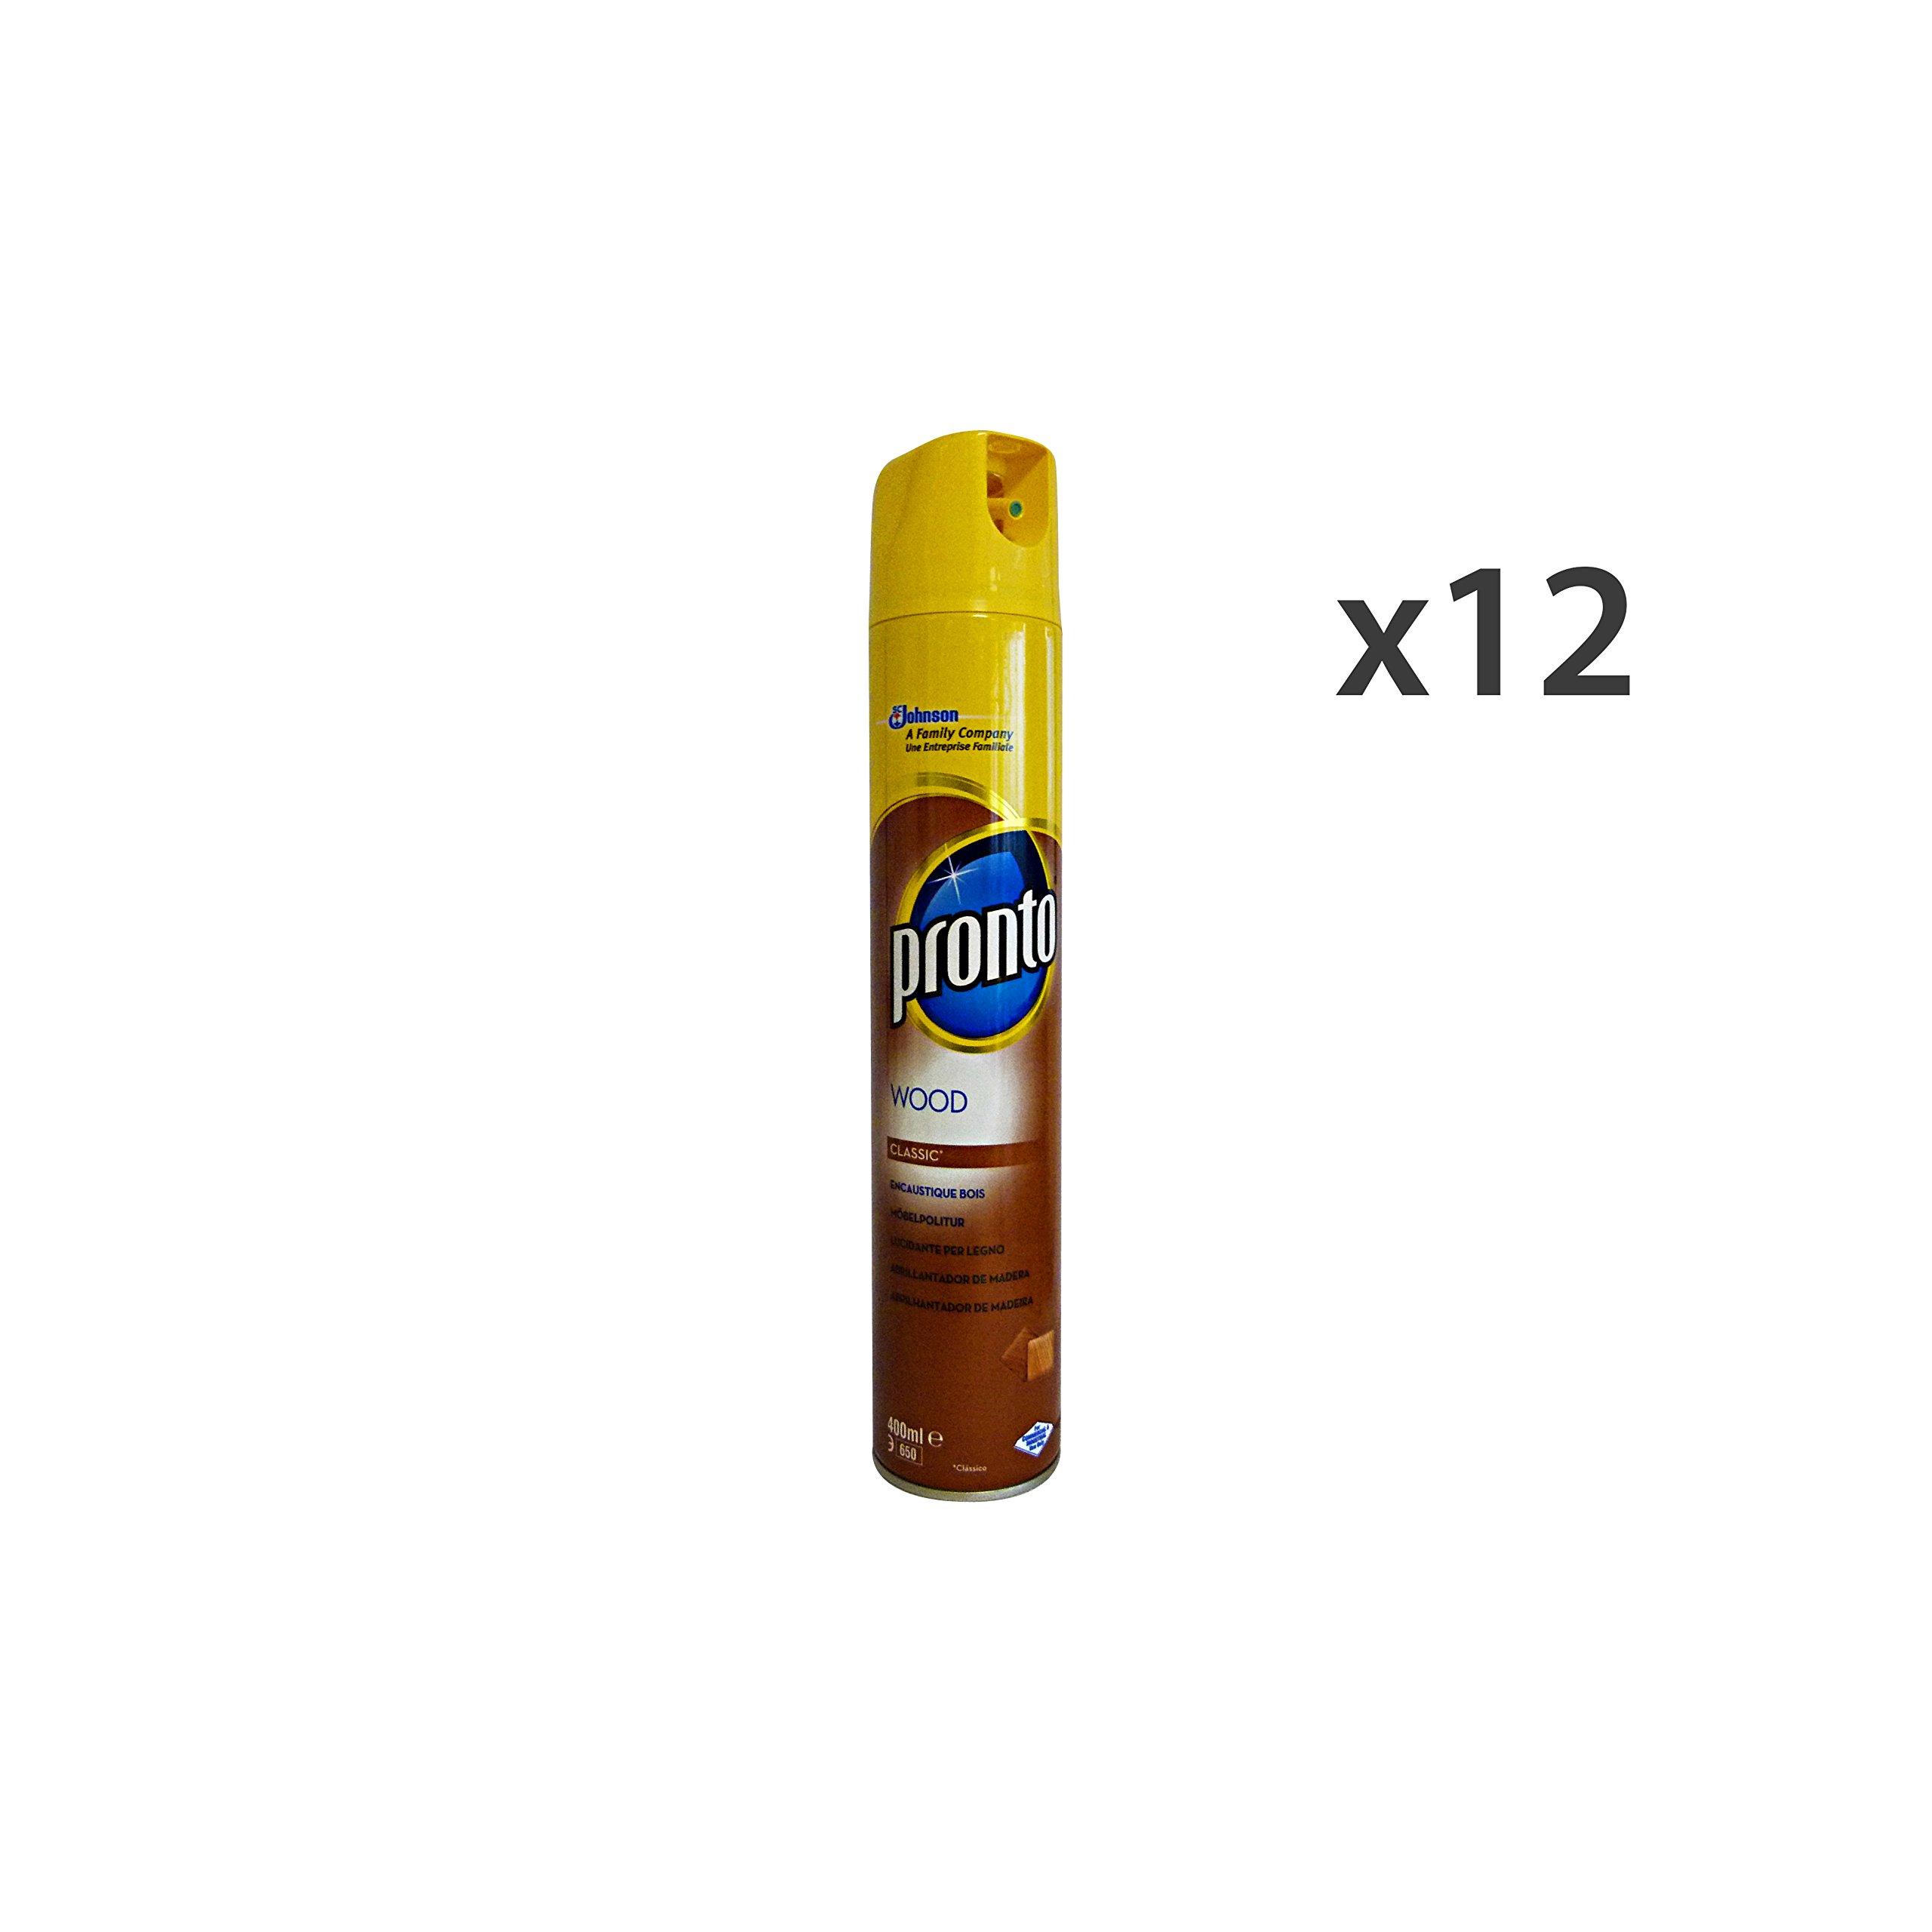 Set 12 Pronto CLASSIC Spray 400 Ml. Detergenti casa